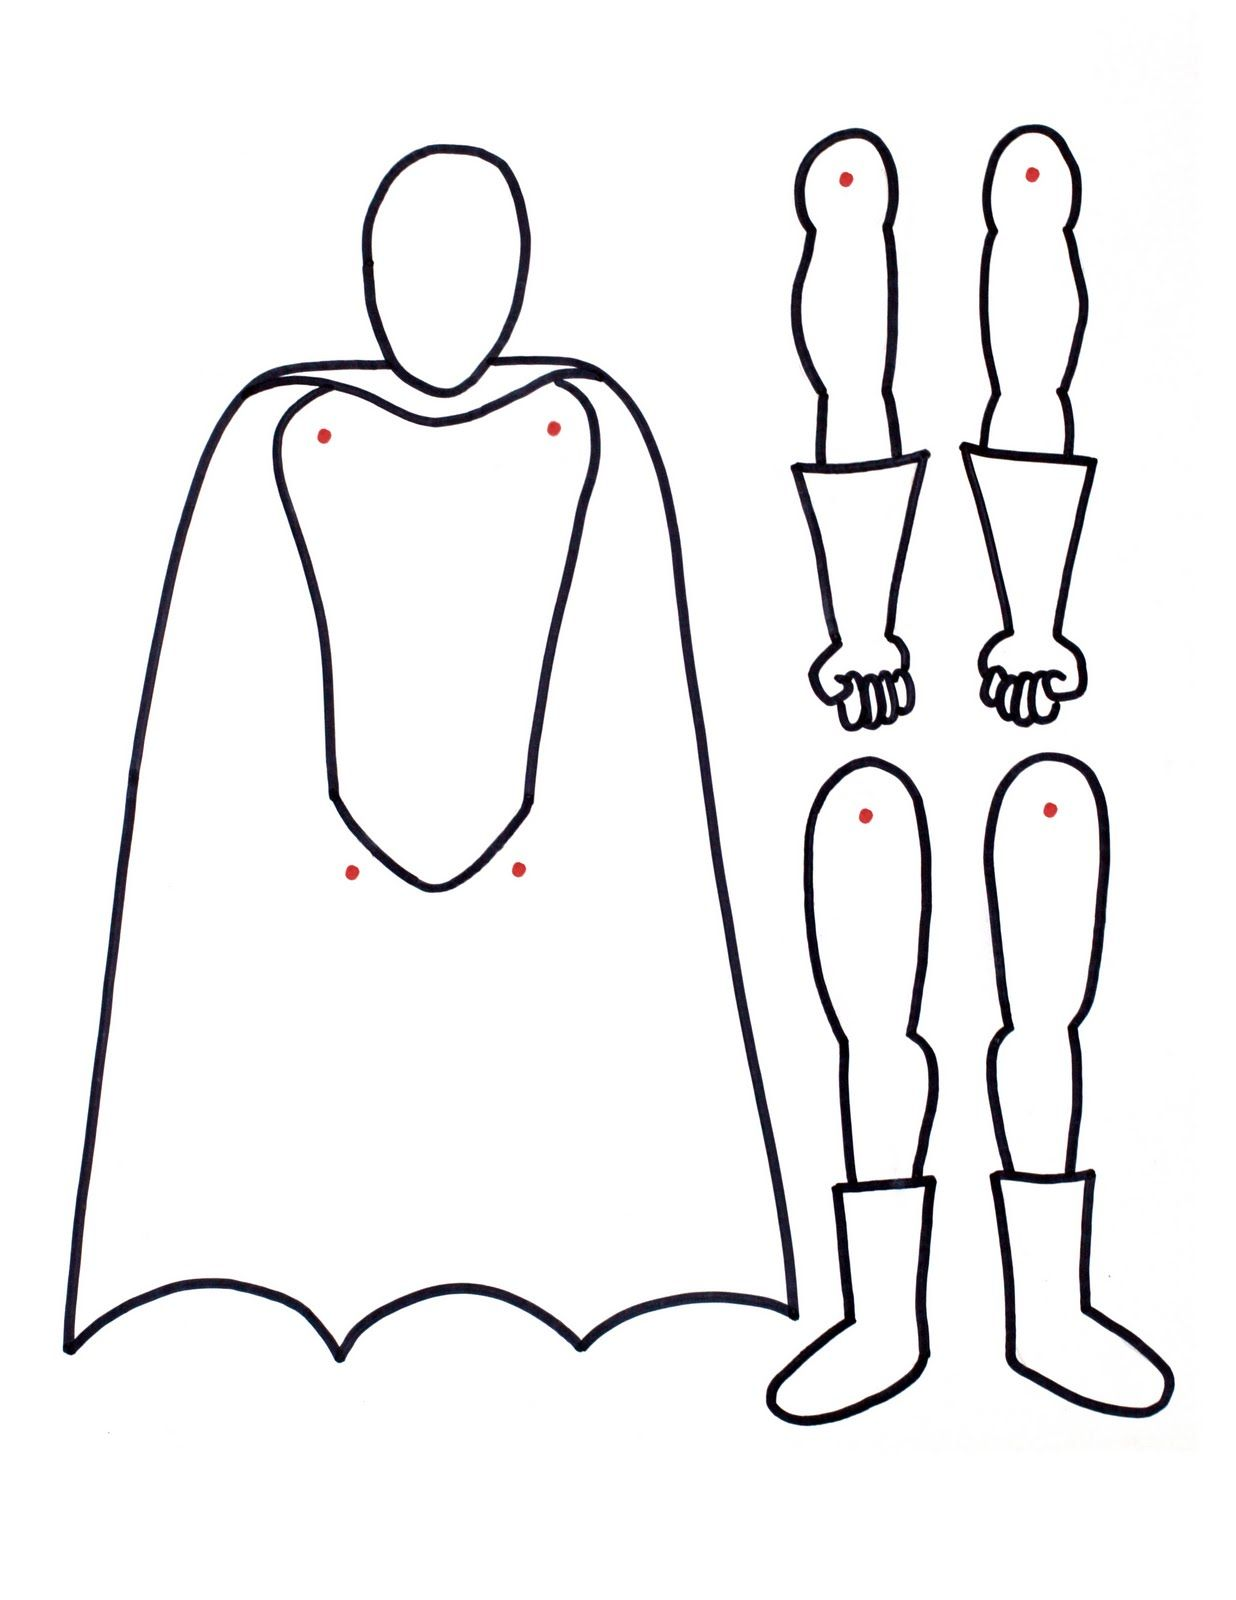 blank superhero template